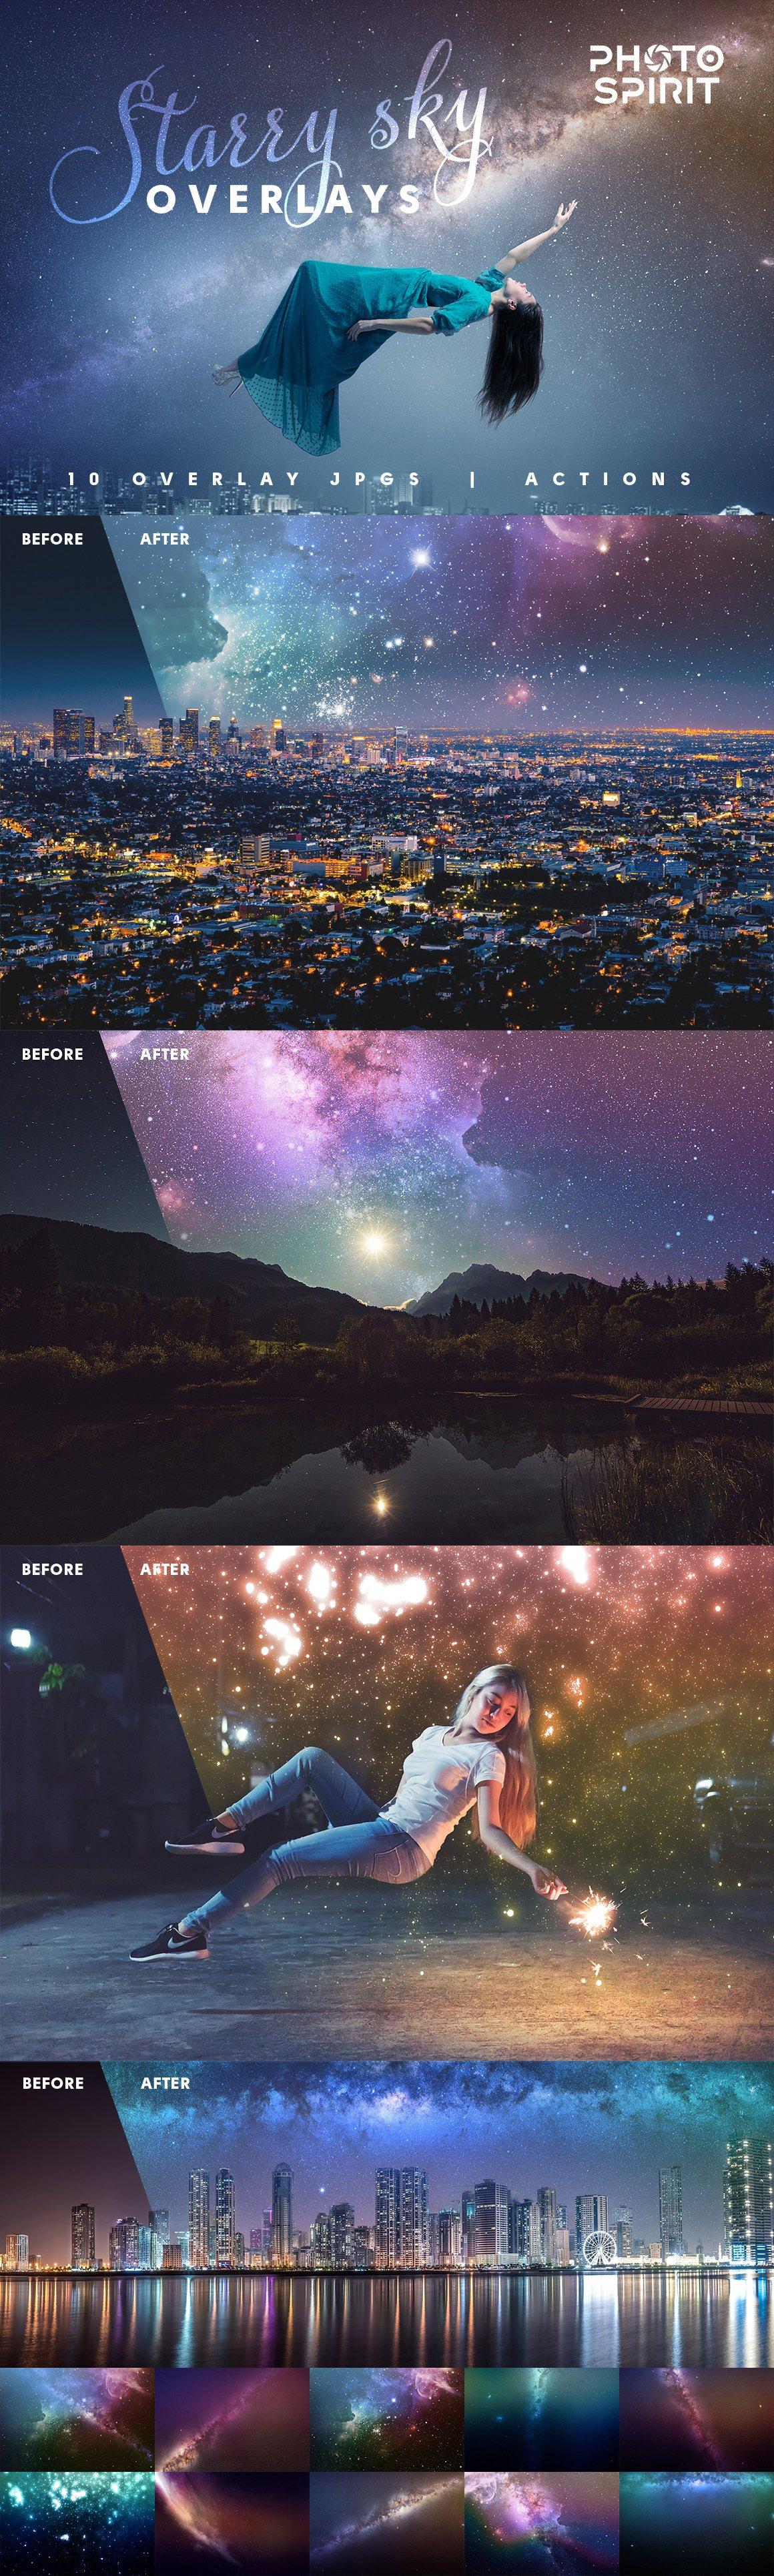 Night Sky Starry Overlays + Actions - night sky starry overlays 0